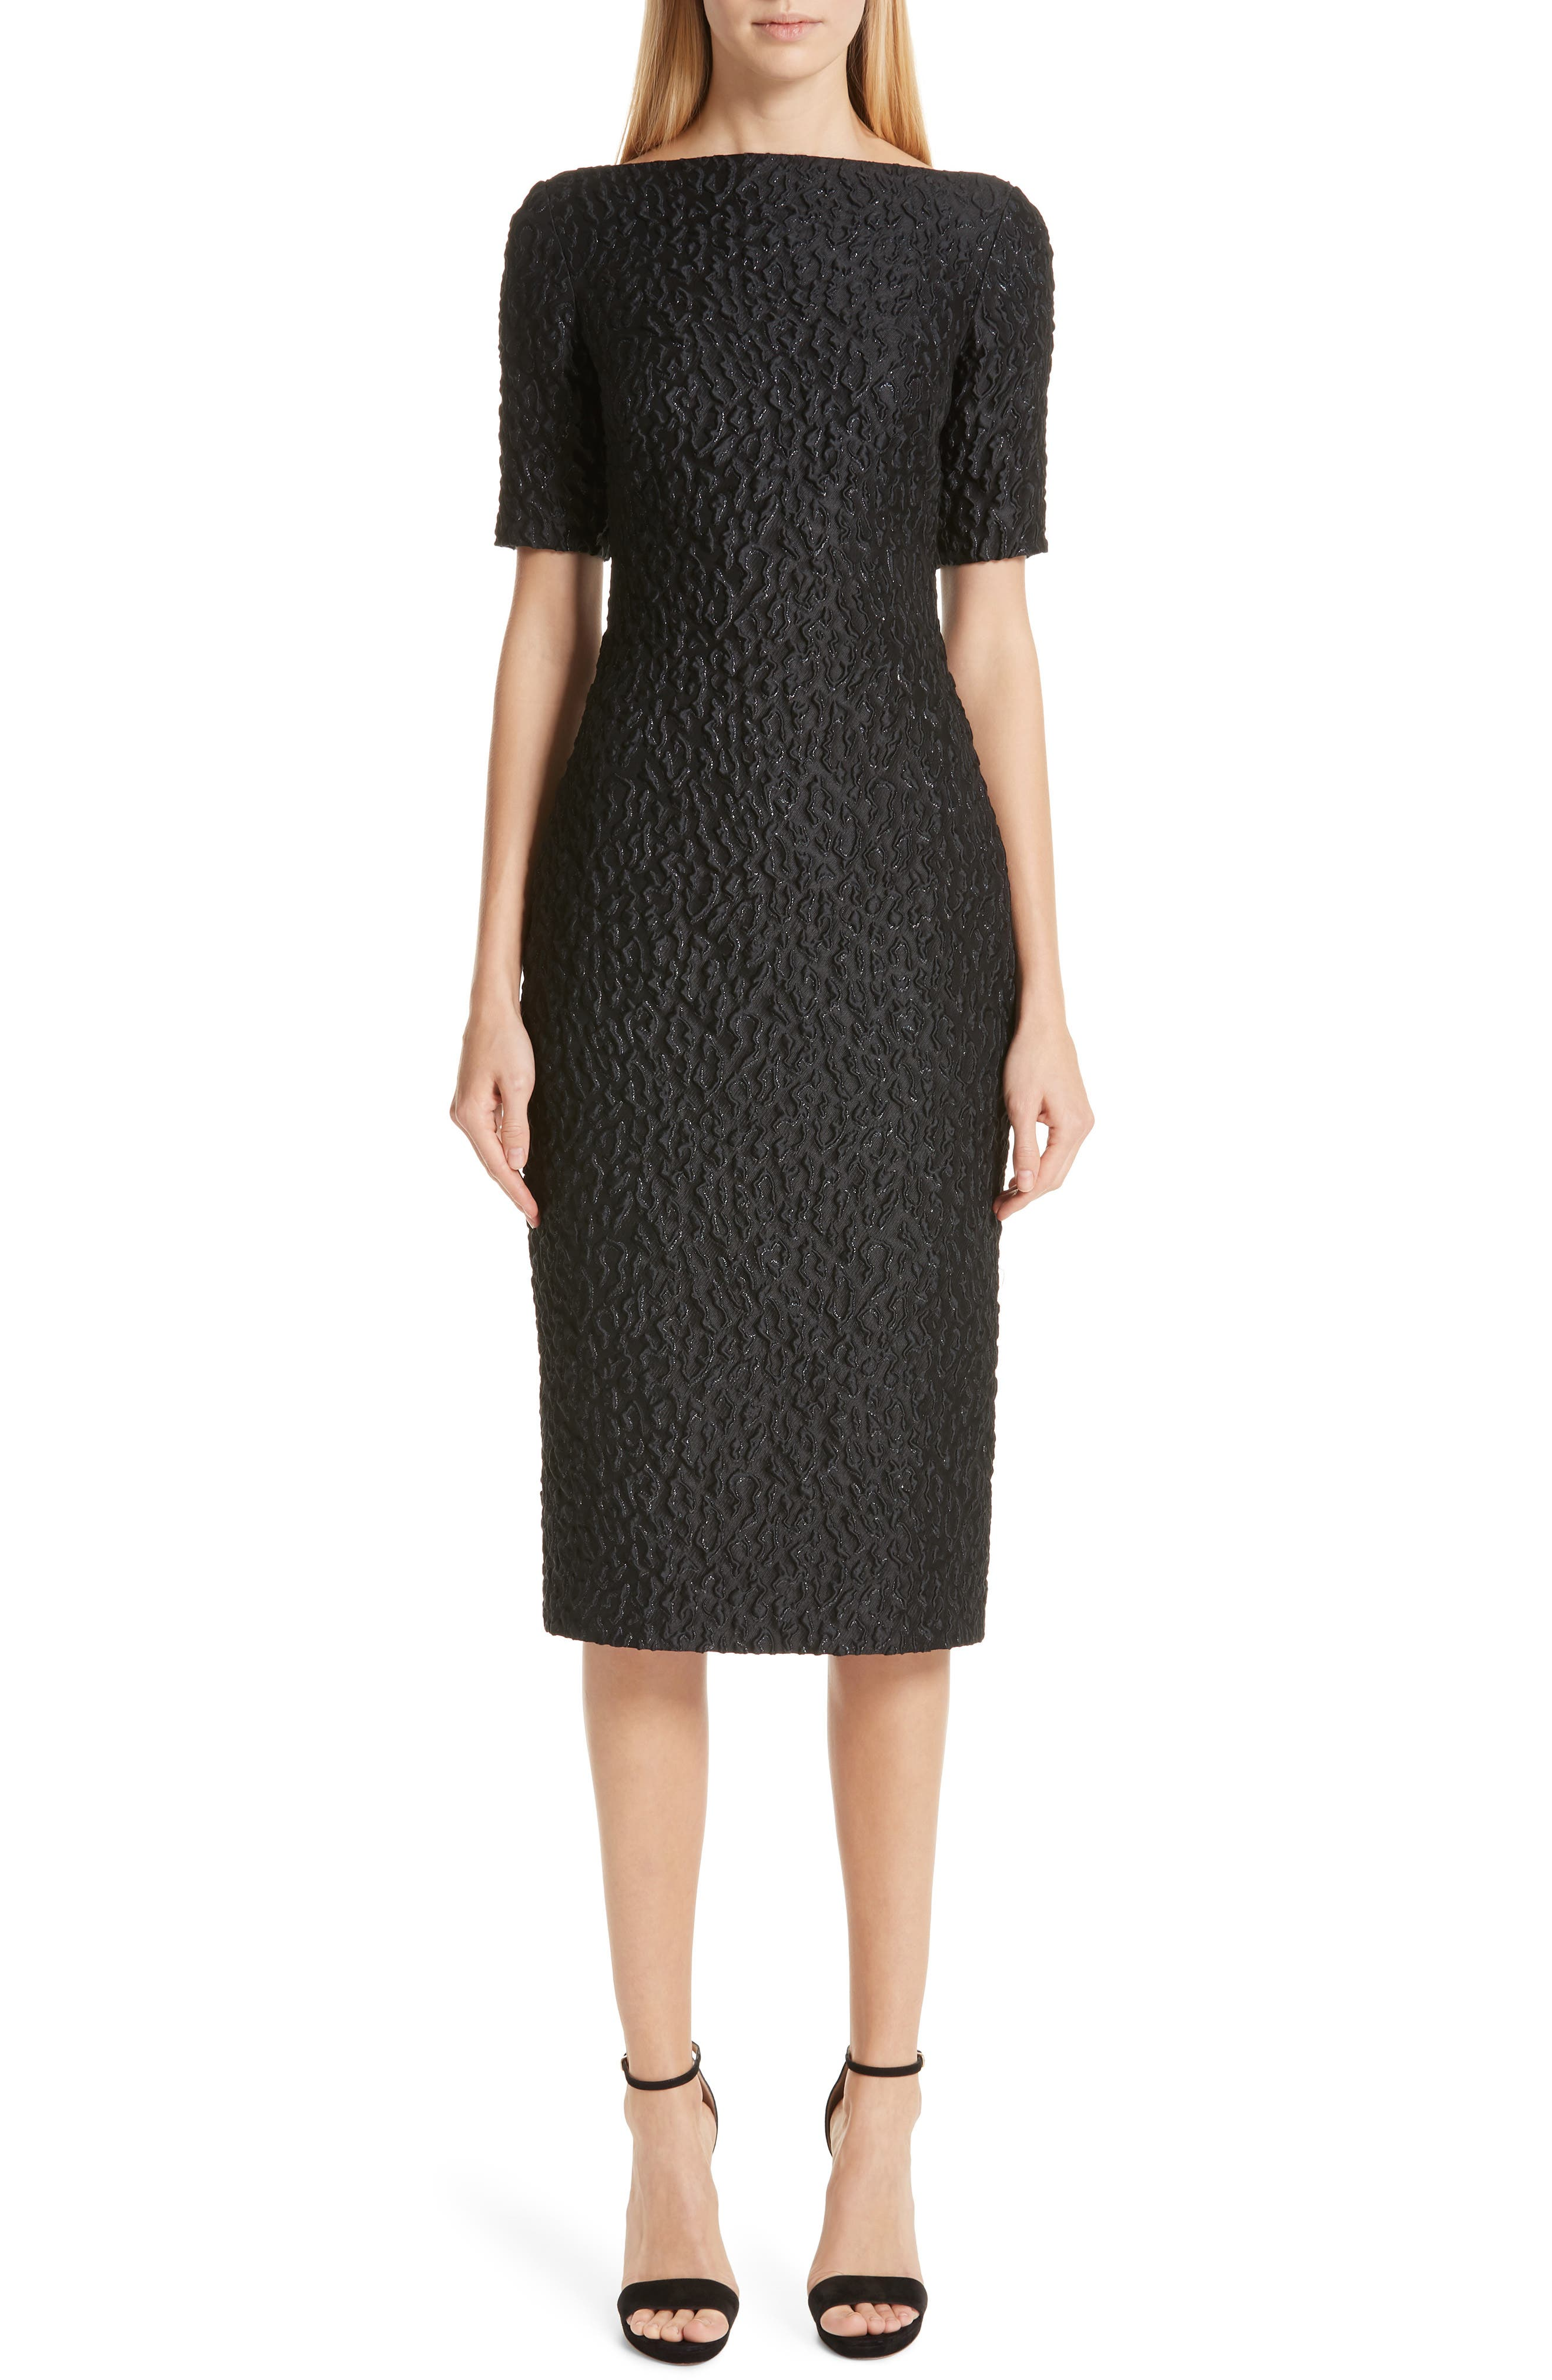 BRANDON MAXWELL Leopard Jacquard Sheath Dress, Main, color, BLACK